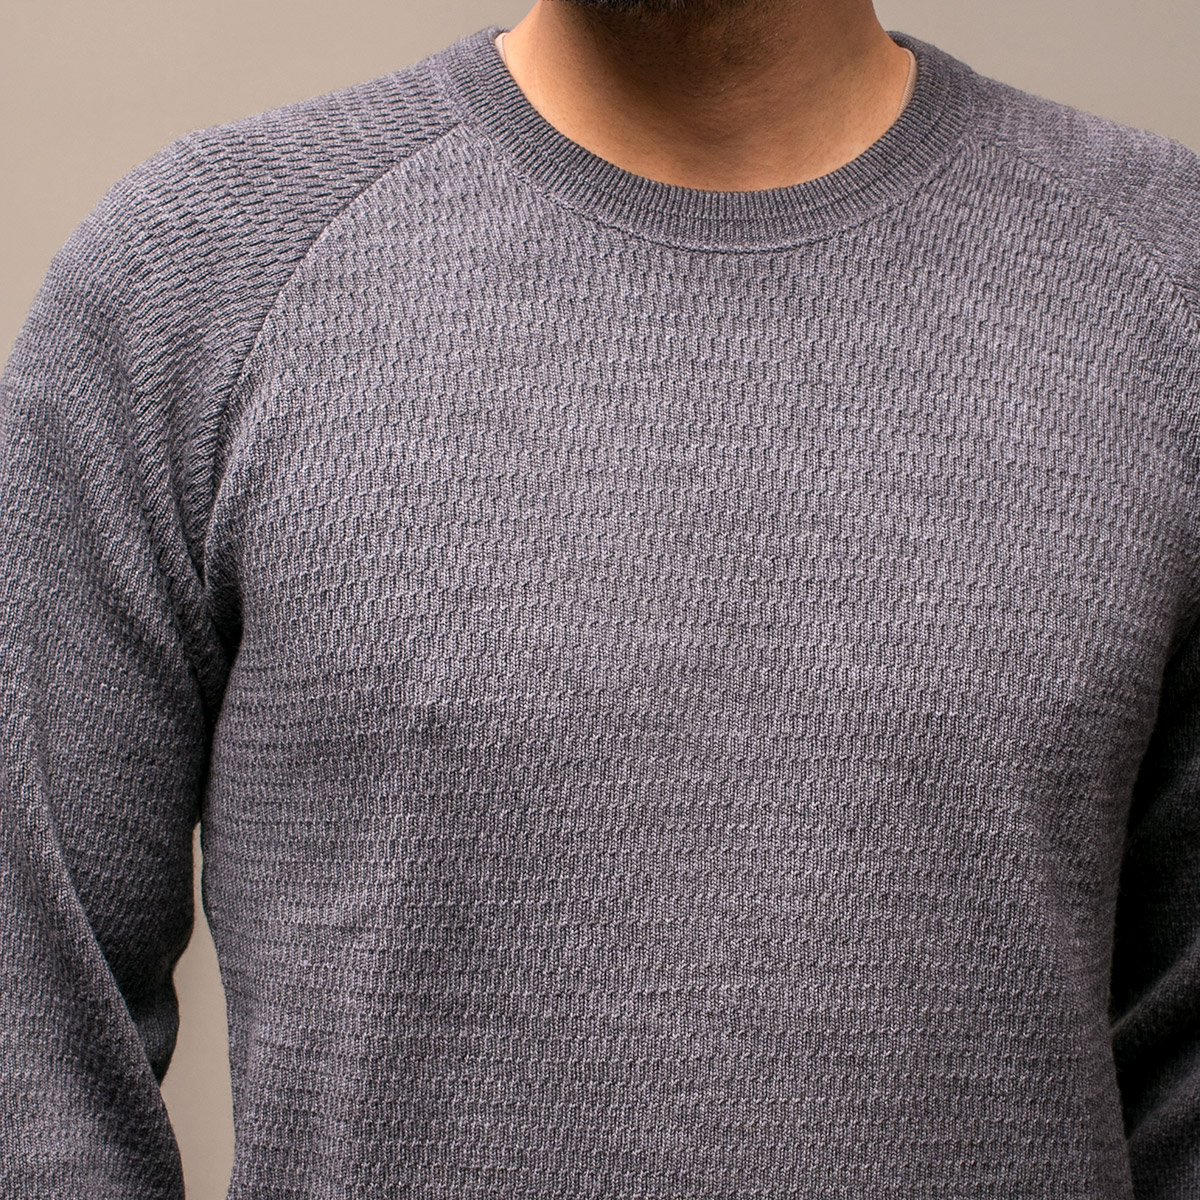 STEVENSON OVERALL Co. Wool Thermal Long Sleeve - WL Merino Wool ウールサーマルシャツ